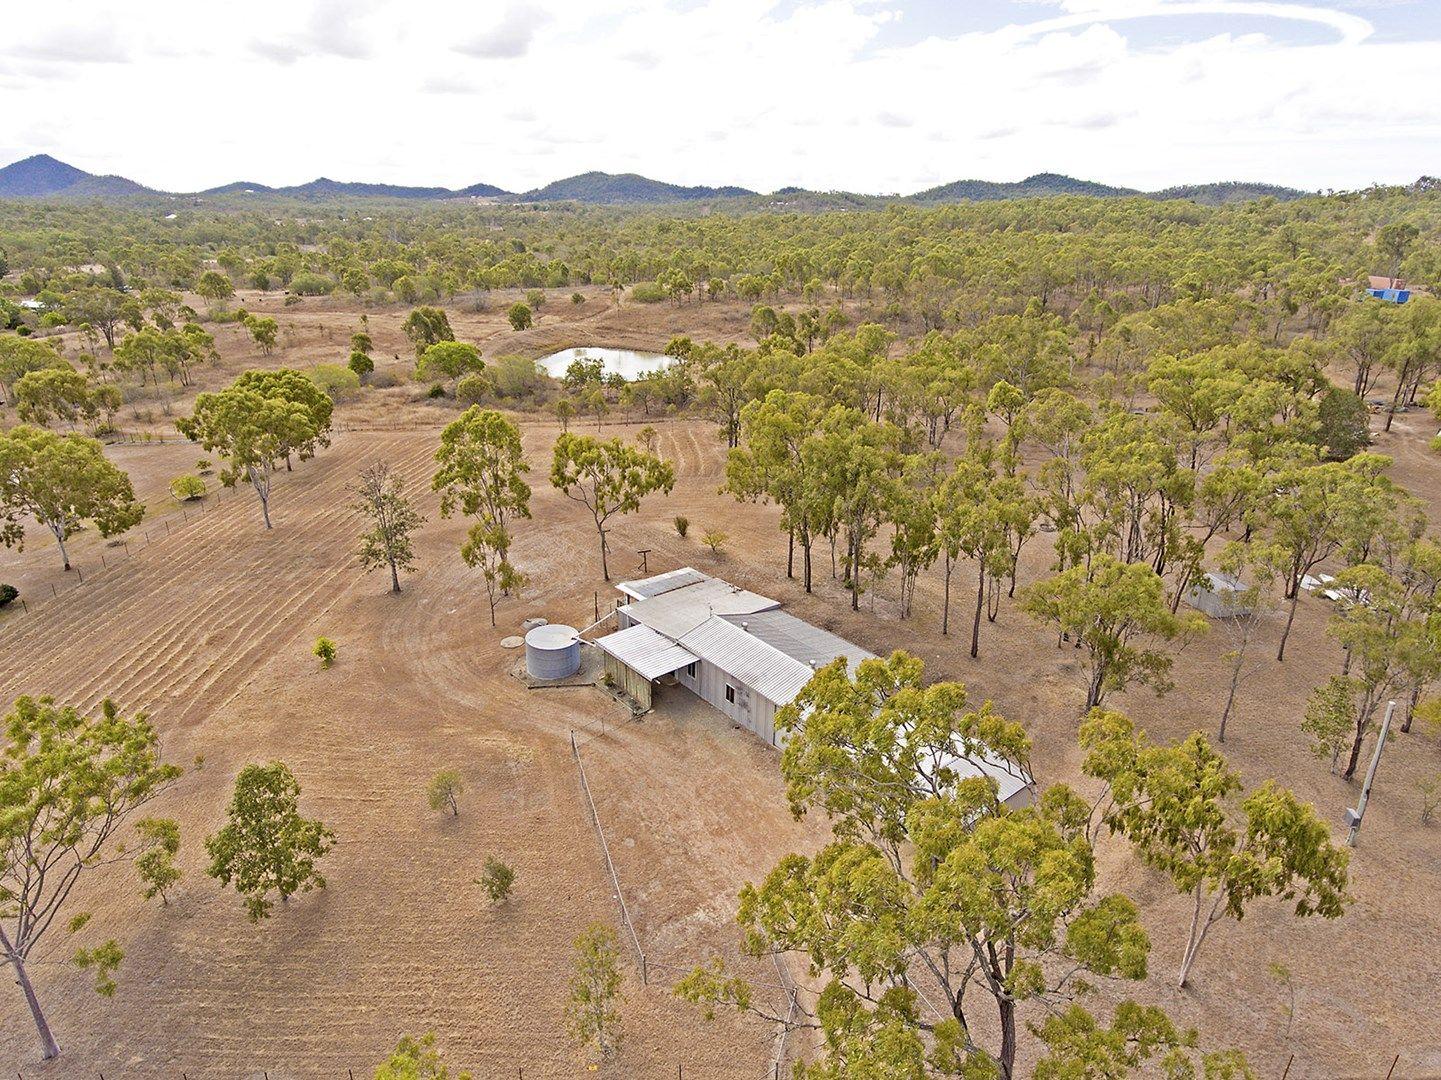 39 GARN HATCH LANE, Etna Creek QLD 4702, Image 0